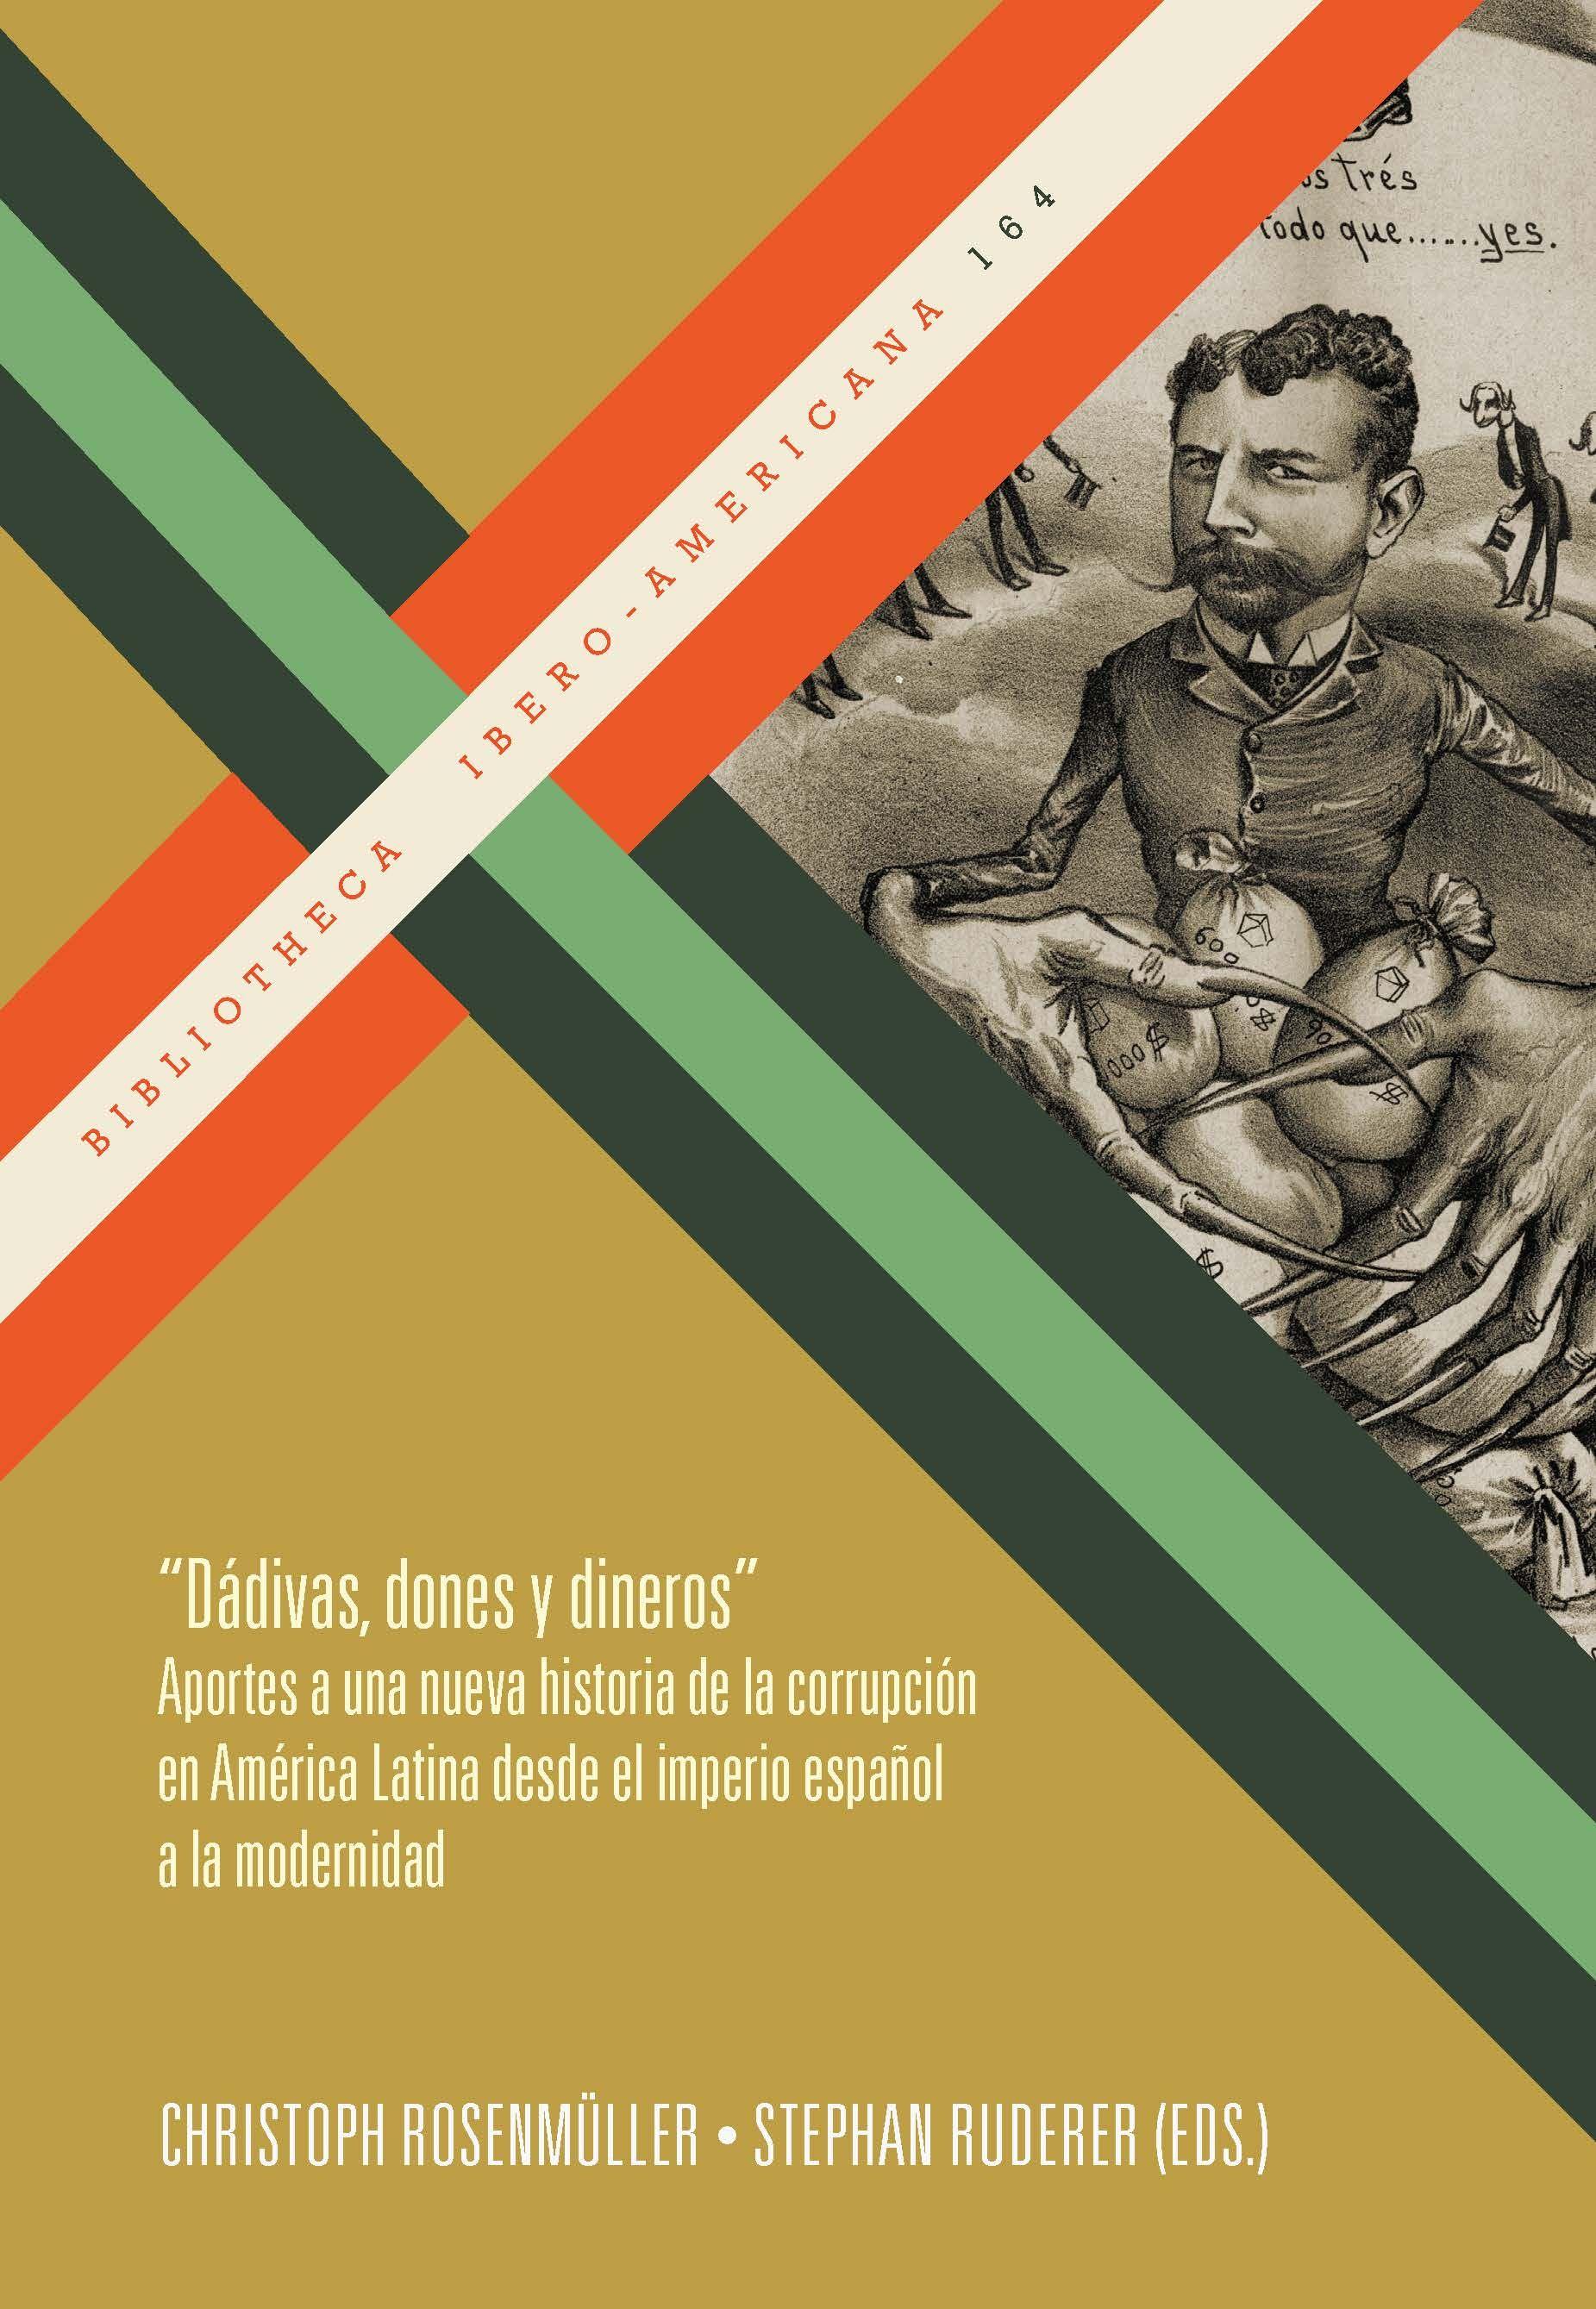 225 aniversario de la ULL, por Alfonso V. Carrascosa